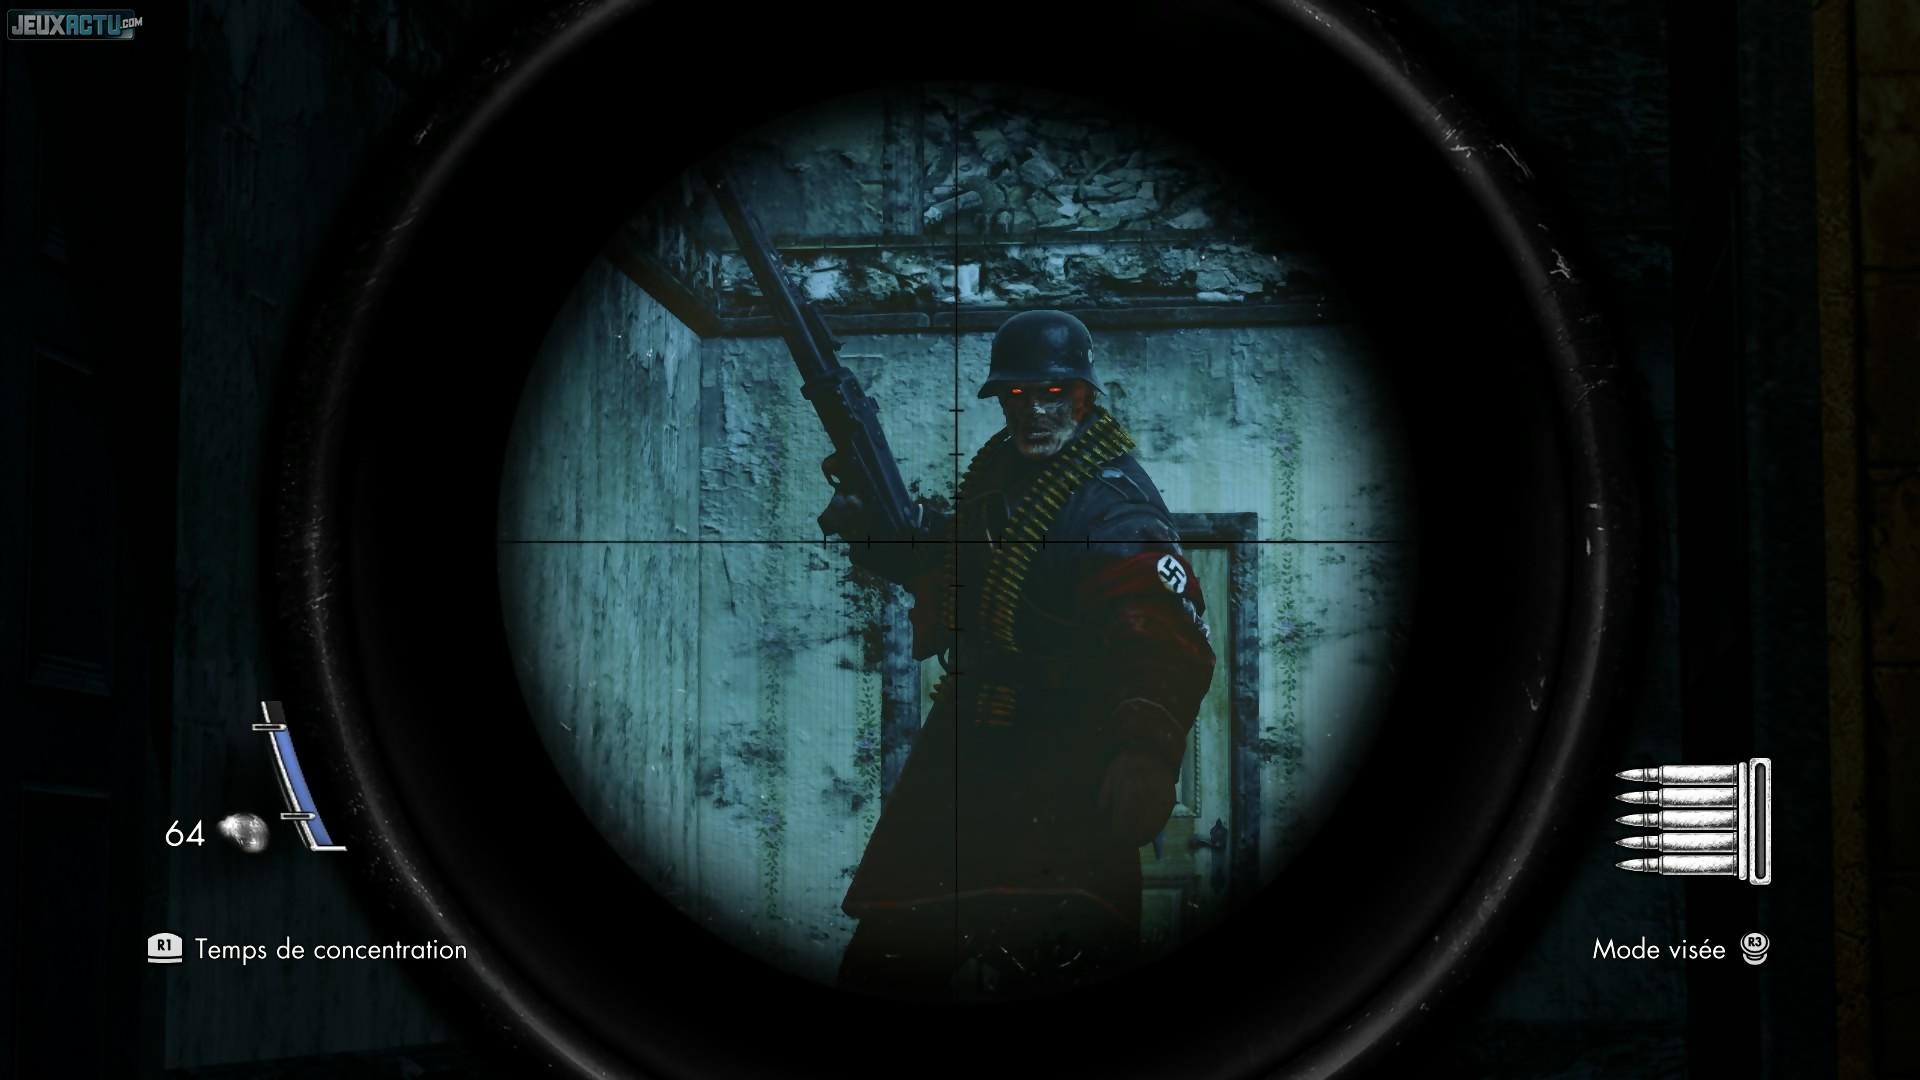 https://hitek.fr/actualite/top-jeux-video-zombies_2268